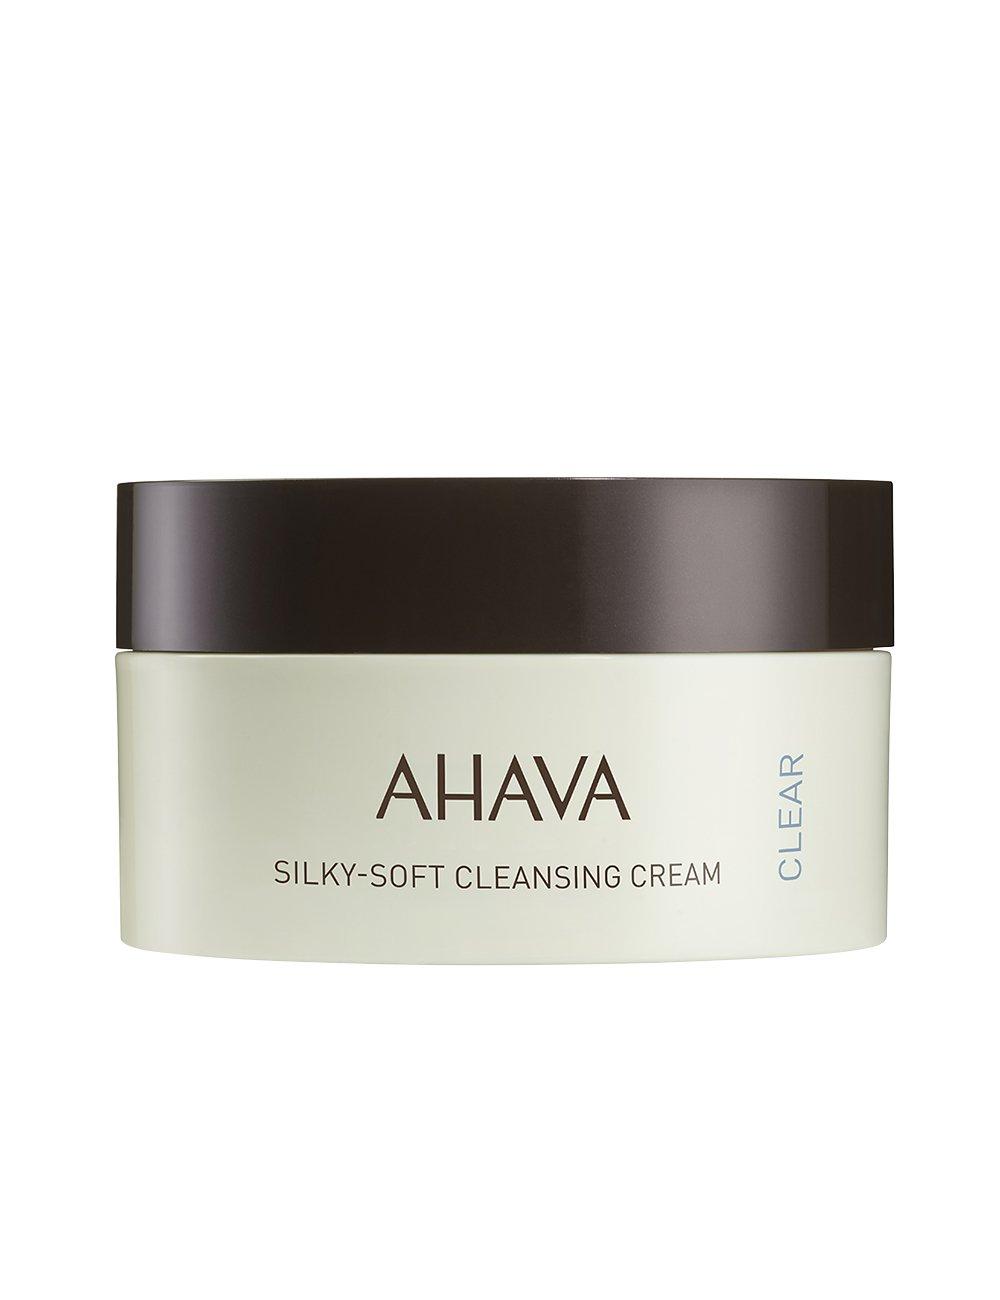 AHAVA - Silky-Soft Cleansing Cream 100 ml